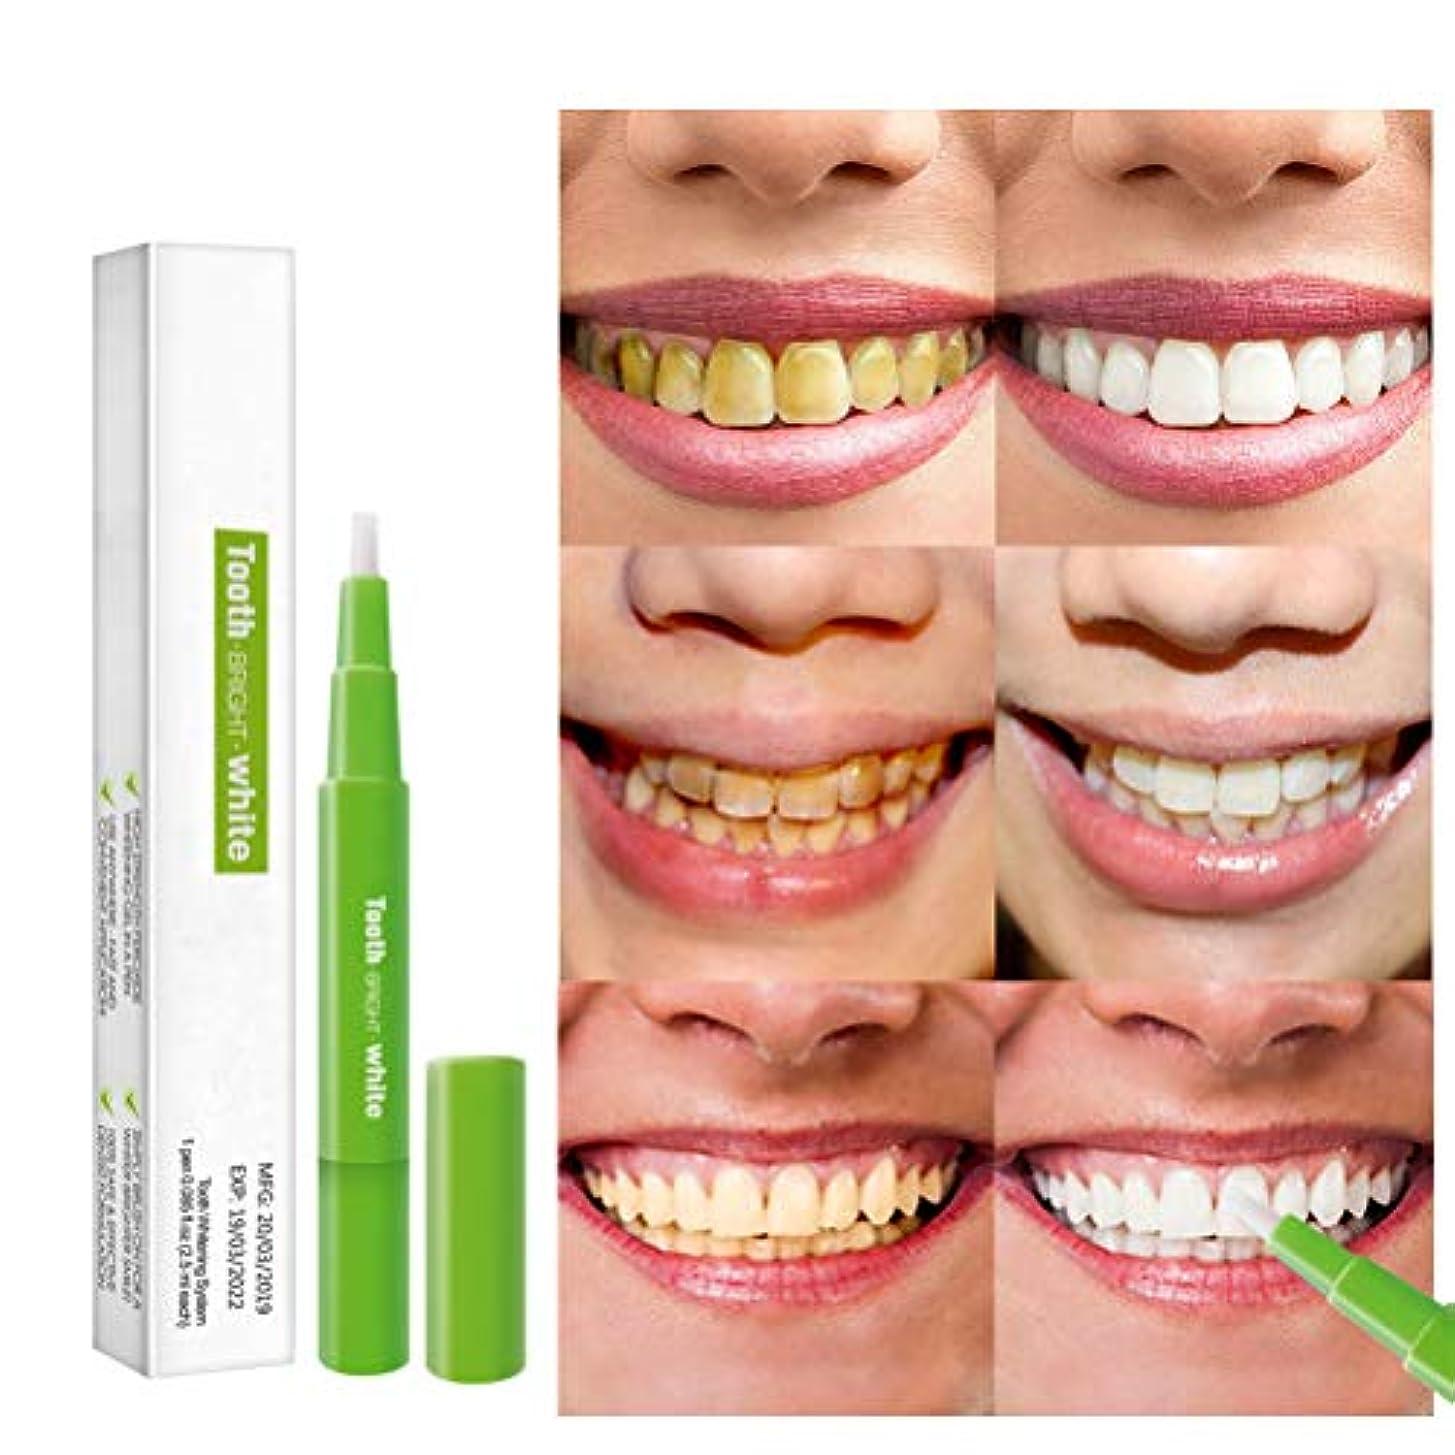 Creacom 歯 ホワイトニング ペン 美白歯ゲル 歯 ホワイトニングペン ホワイトニングペン 歯ブラシ 輝く笑顔 口臭防止 歯周病防止 口腔衛生 携帯便利 安全性 口腔洗浄ツール 輝かしい笑顔を見せる